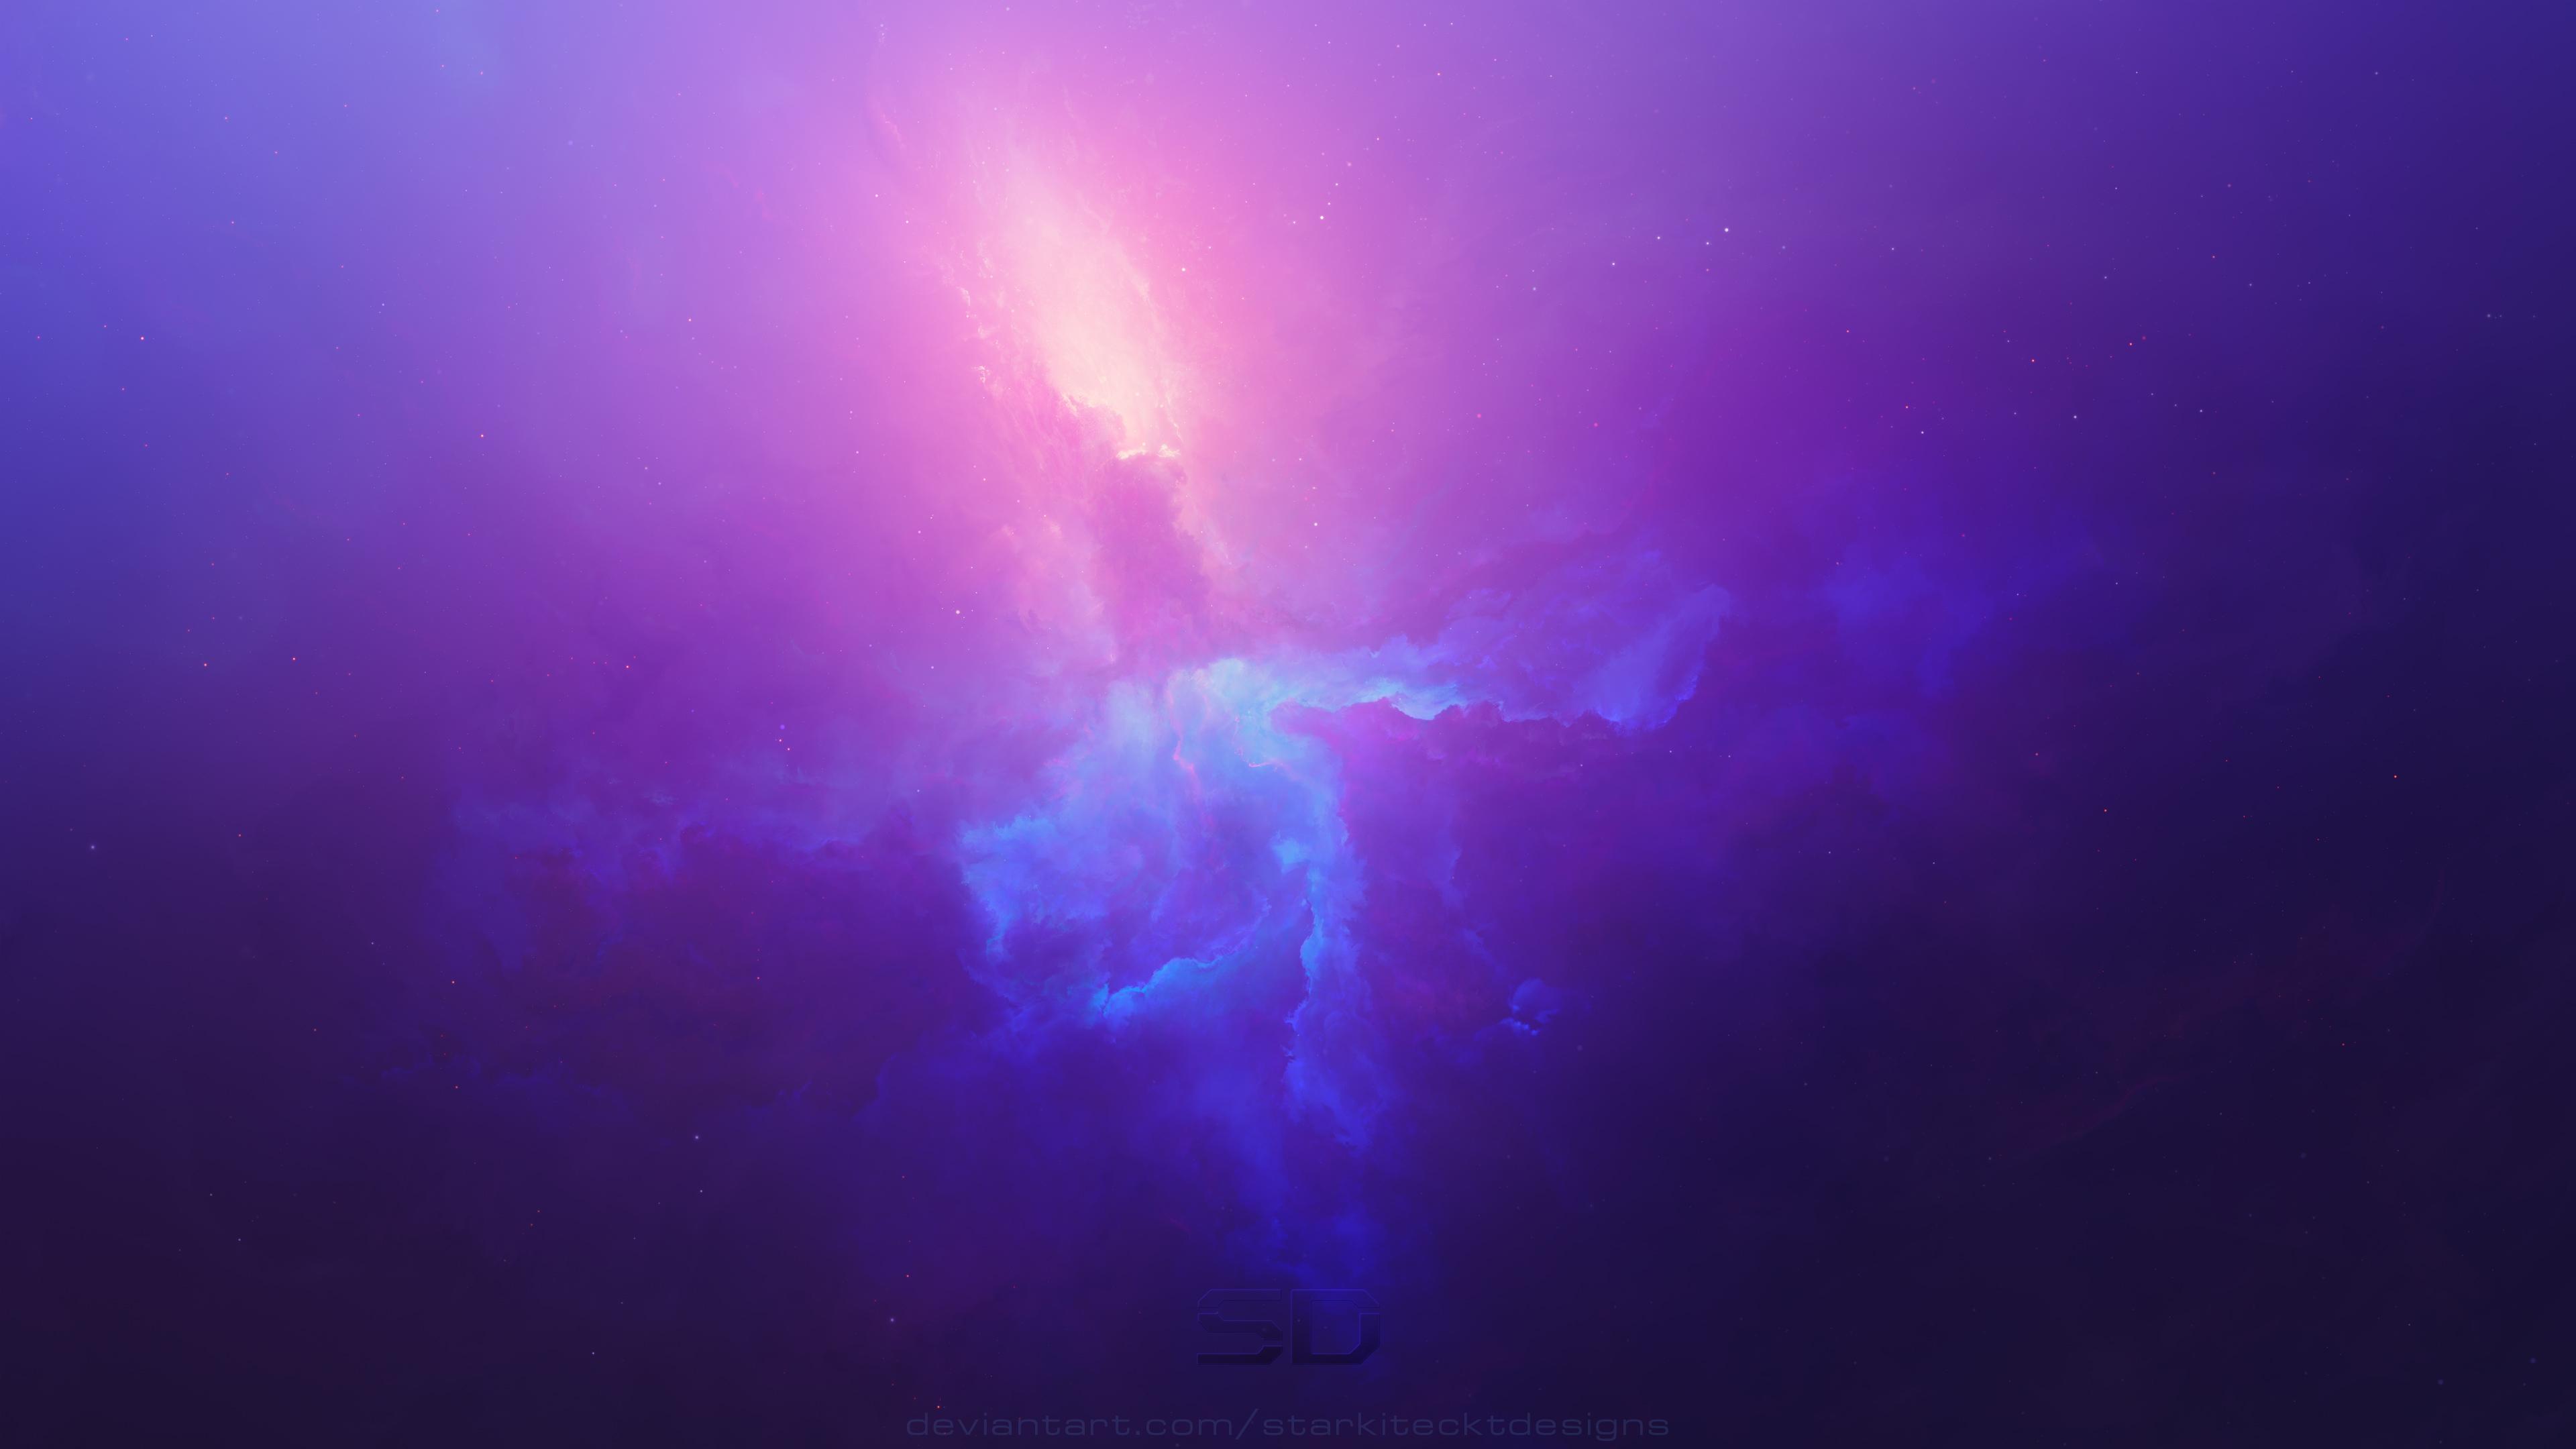 Purple Space Cosmos Abstract 4k Hd Digital Universe 4k